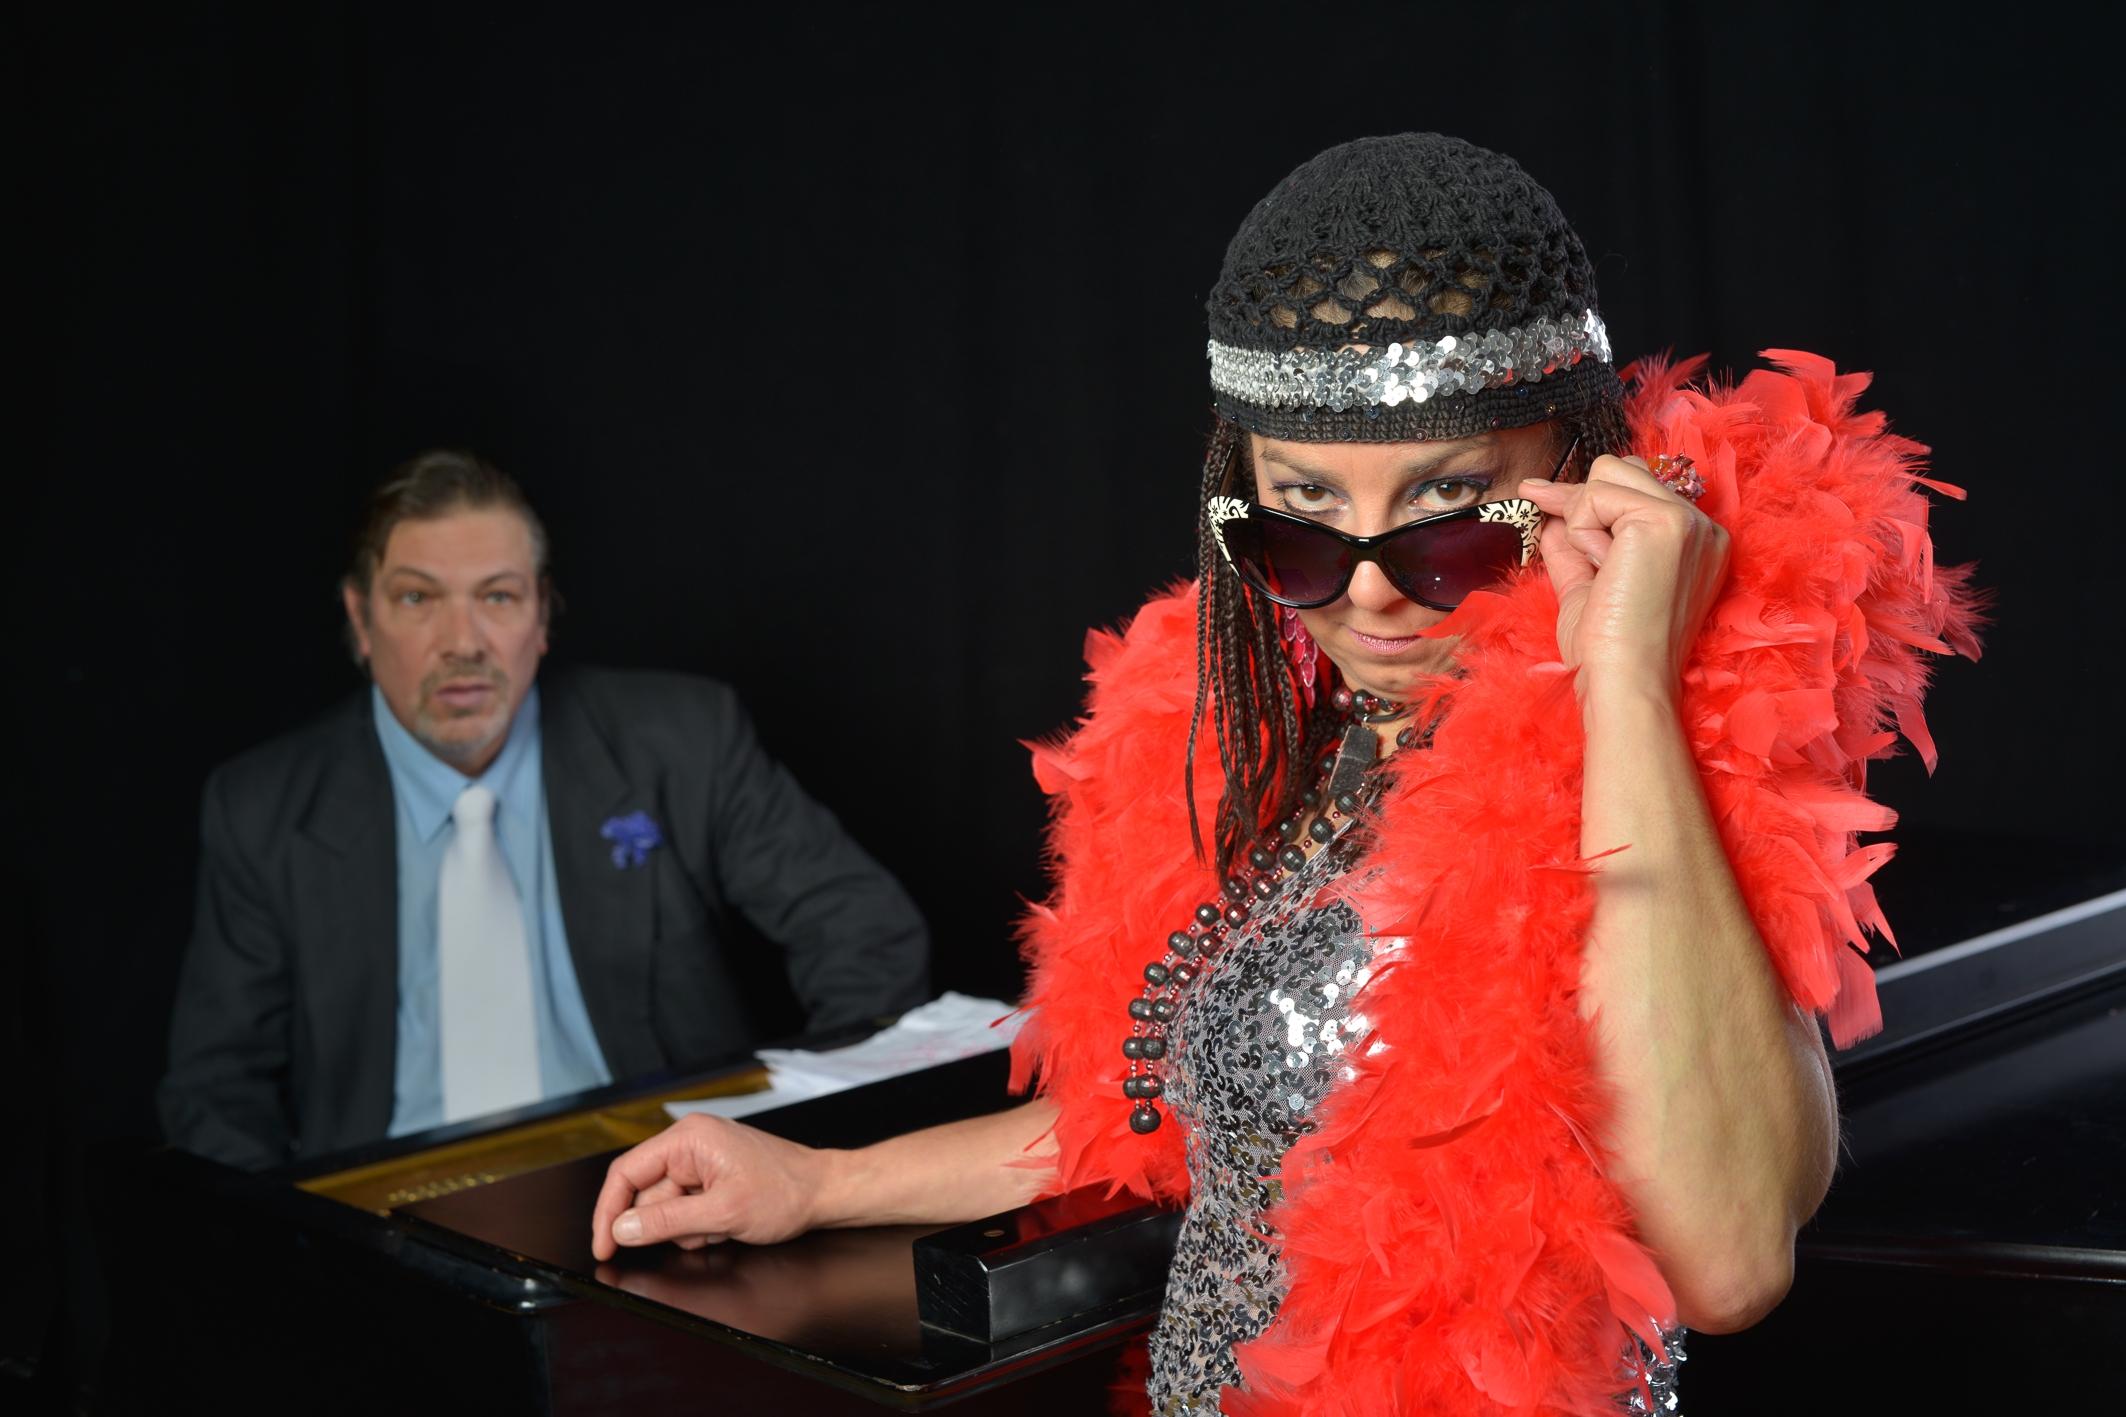 Duo PianLOLA in Schkeuditz